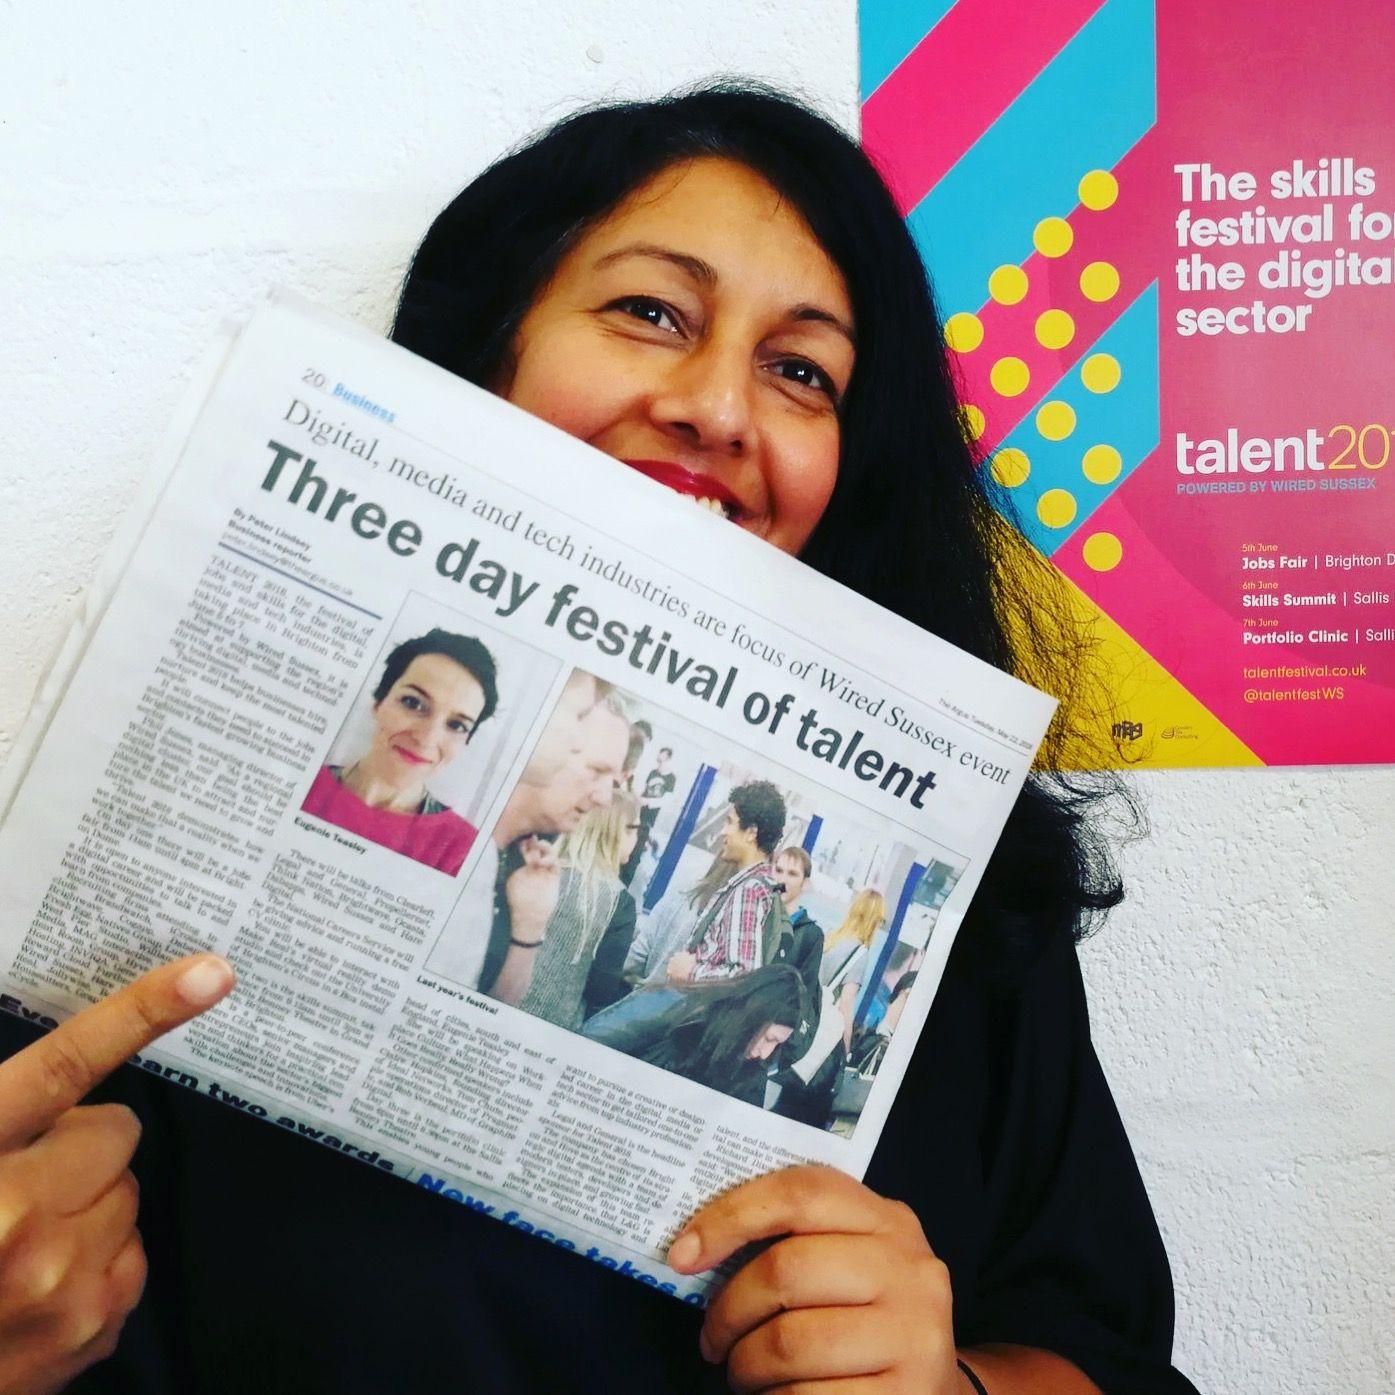 www.talentfestival.co.uk Digital media, Digital, Book cover